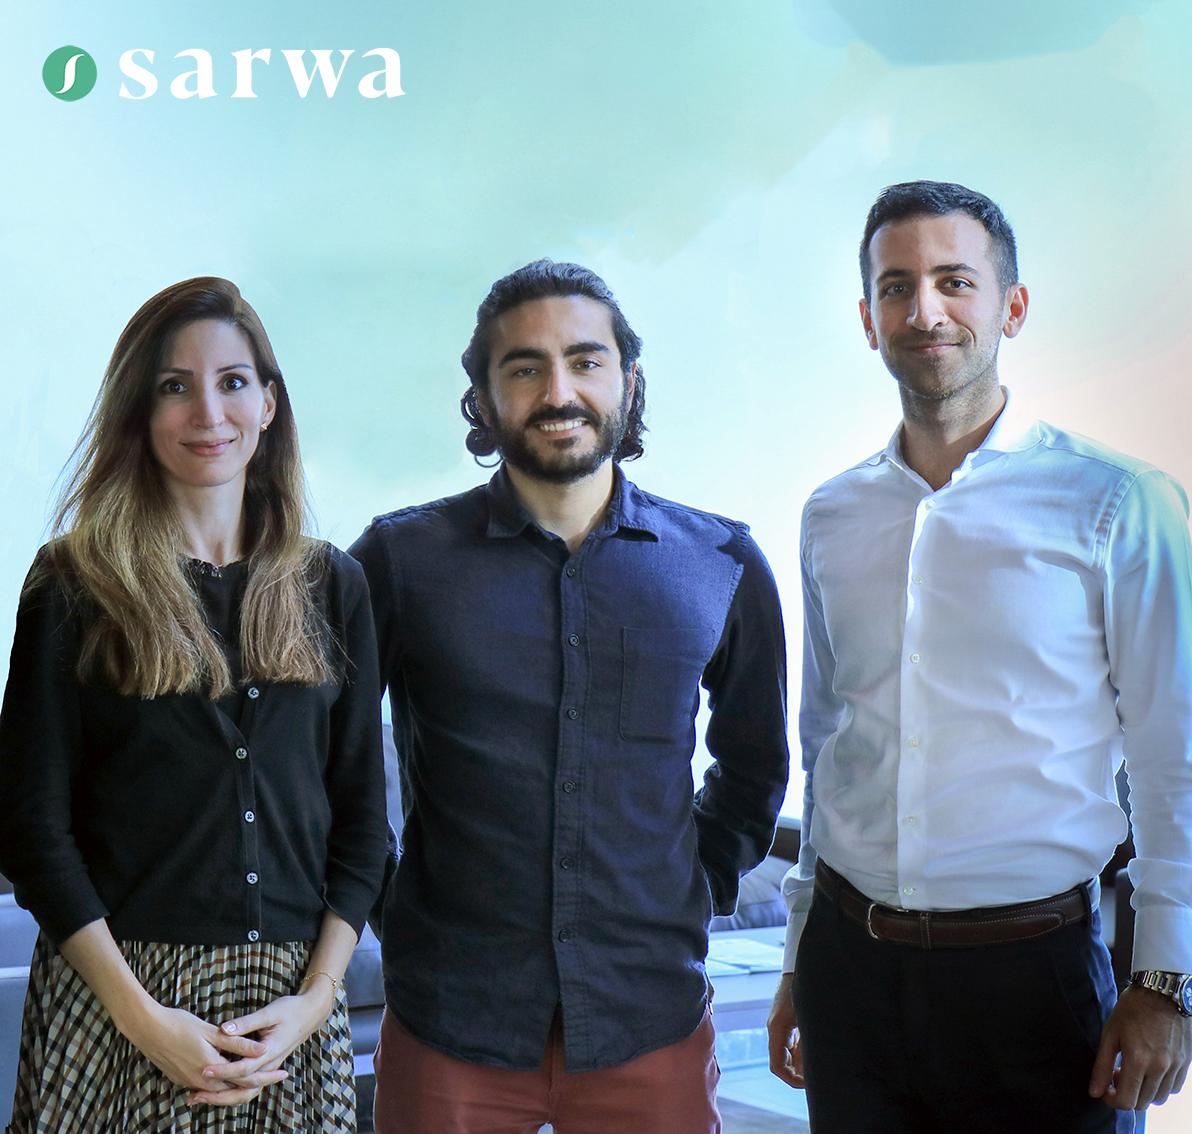 UAE-based FinTech startup Sarwa raises $8.4M Series A funding round led by KIPCO